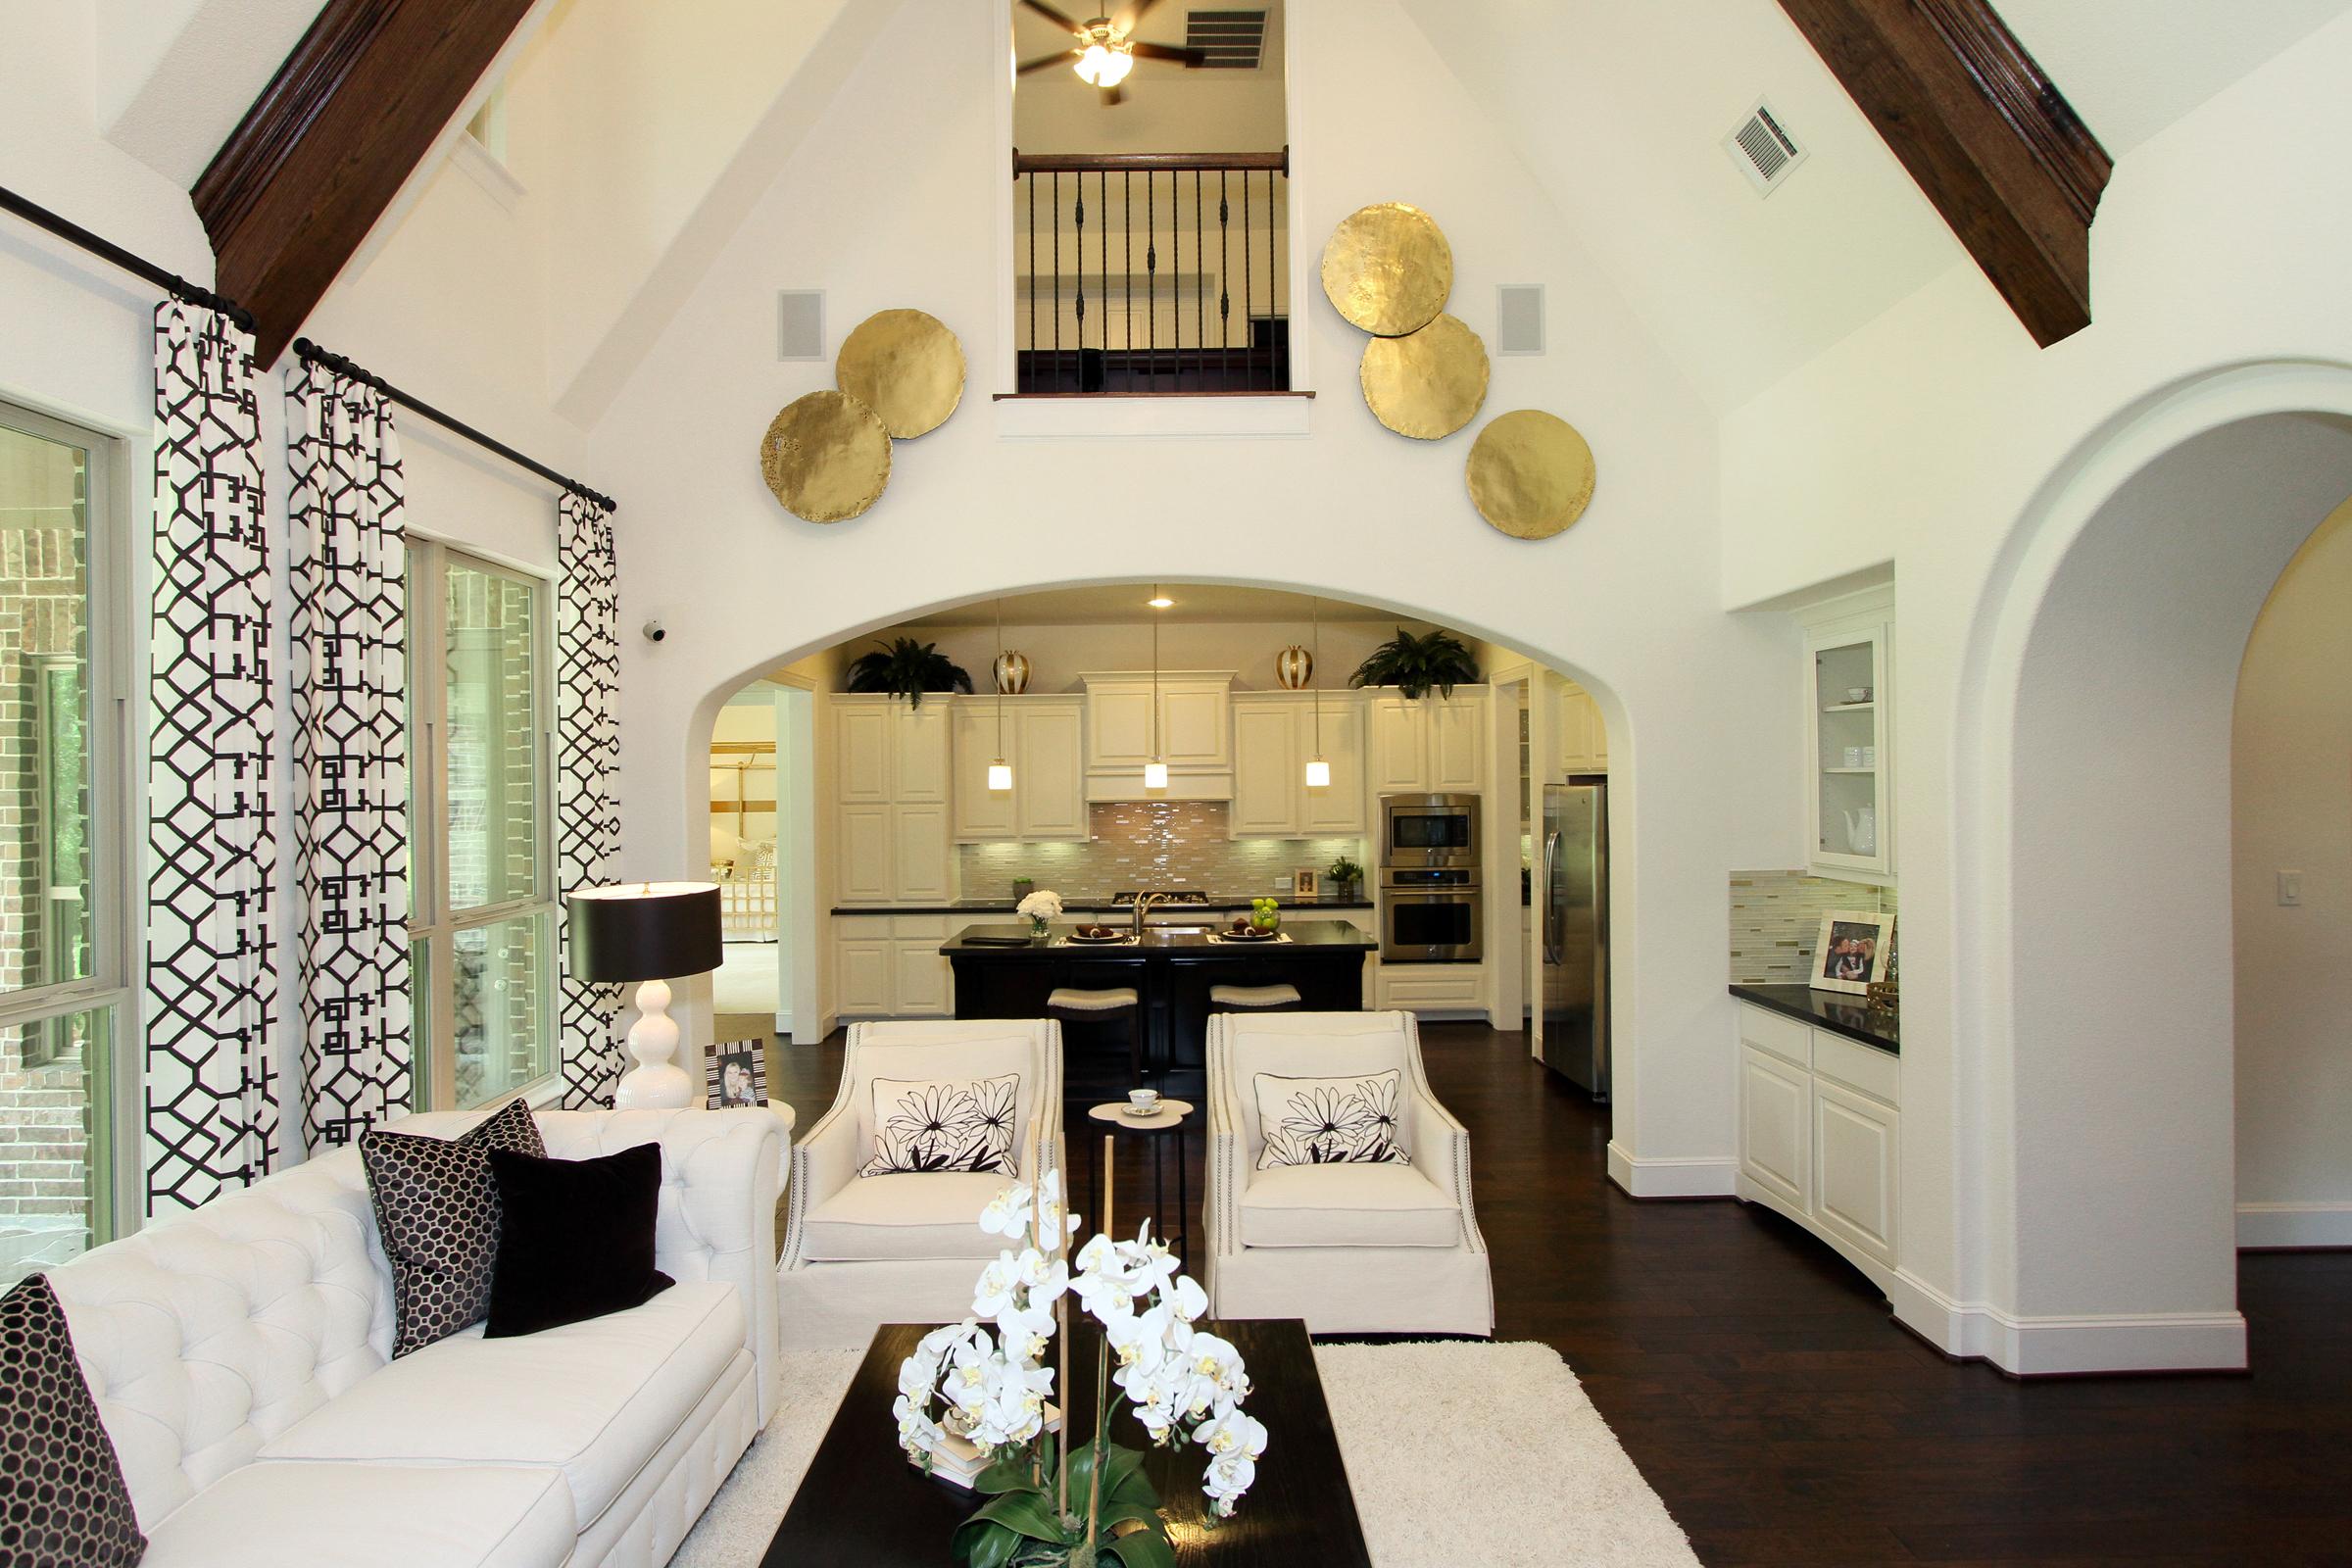 Best Kitchen Gallery: Woodforest Highland Luxury Model Home of Model Homes Texas on rachelxblog.com